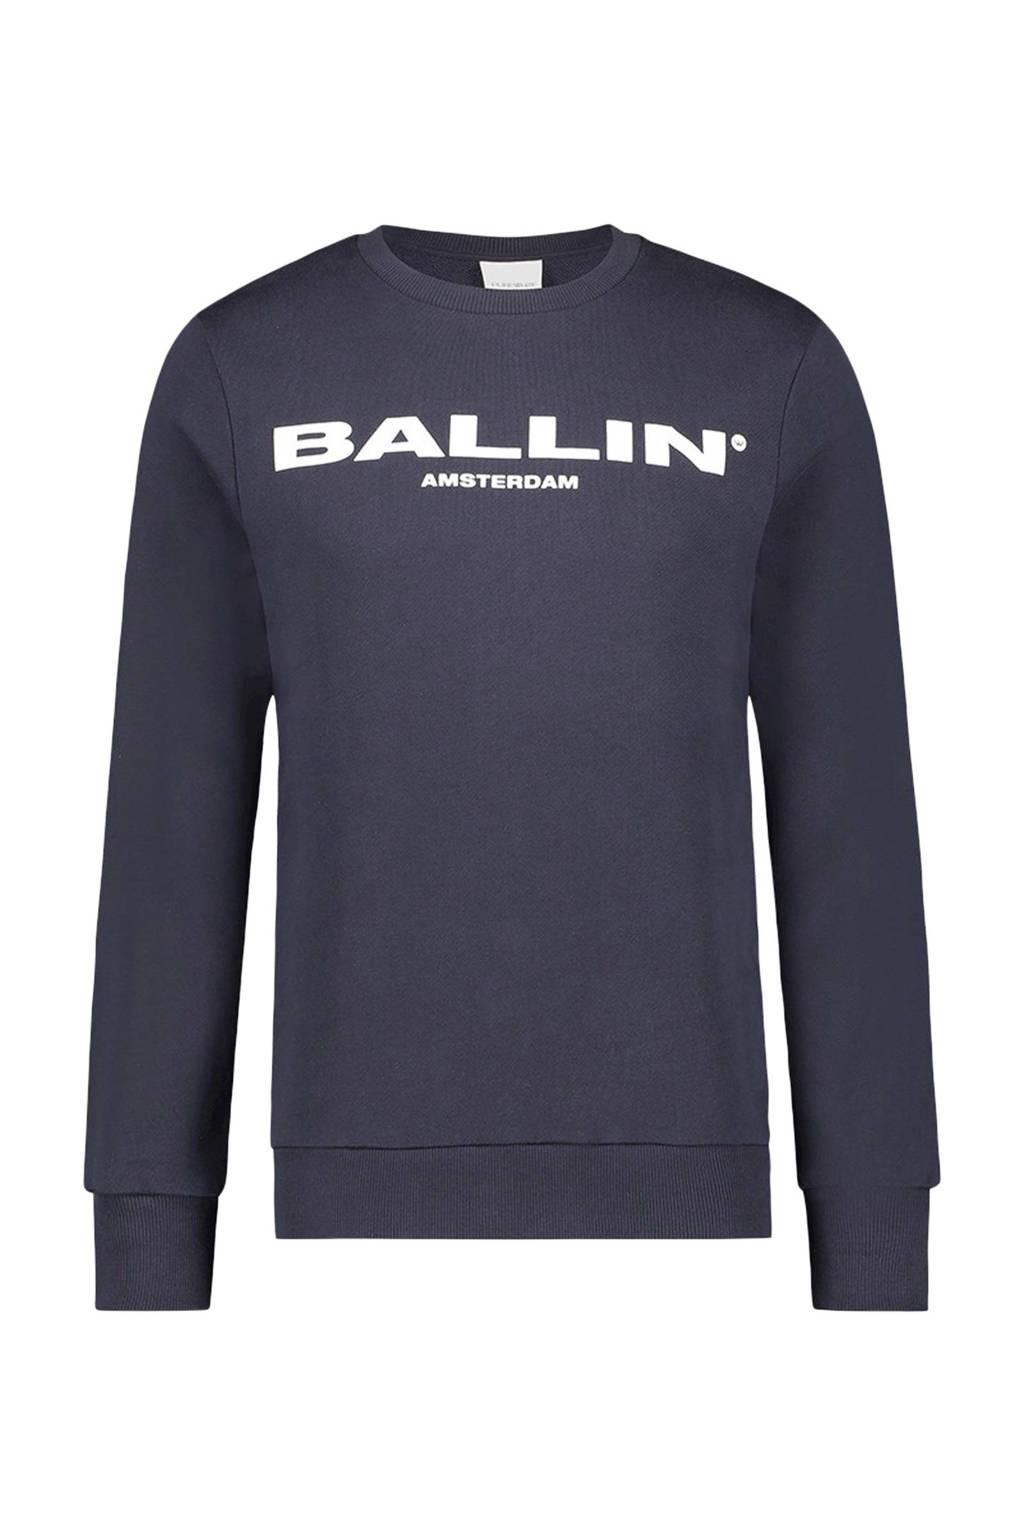 Ballin sweater met tekst donkerblauw, Donkerblauw